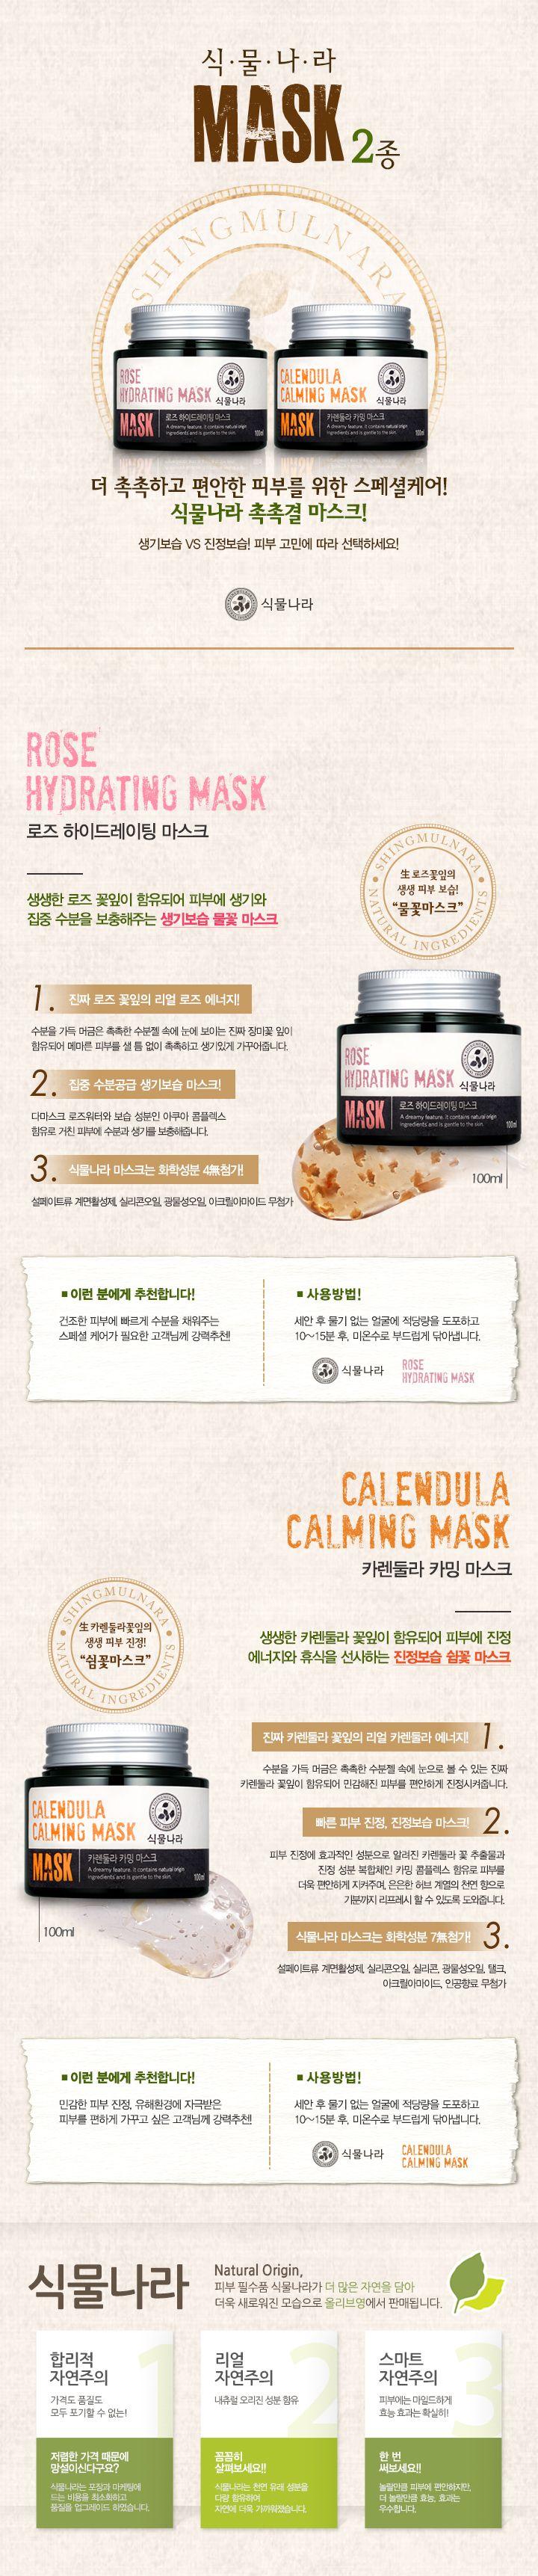 Shingmulnara Mask | The Cutest Makeup